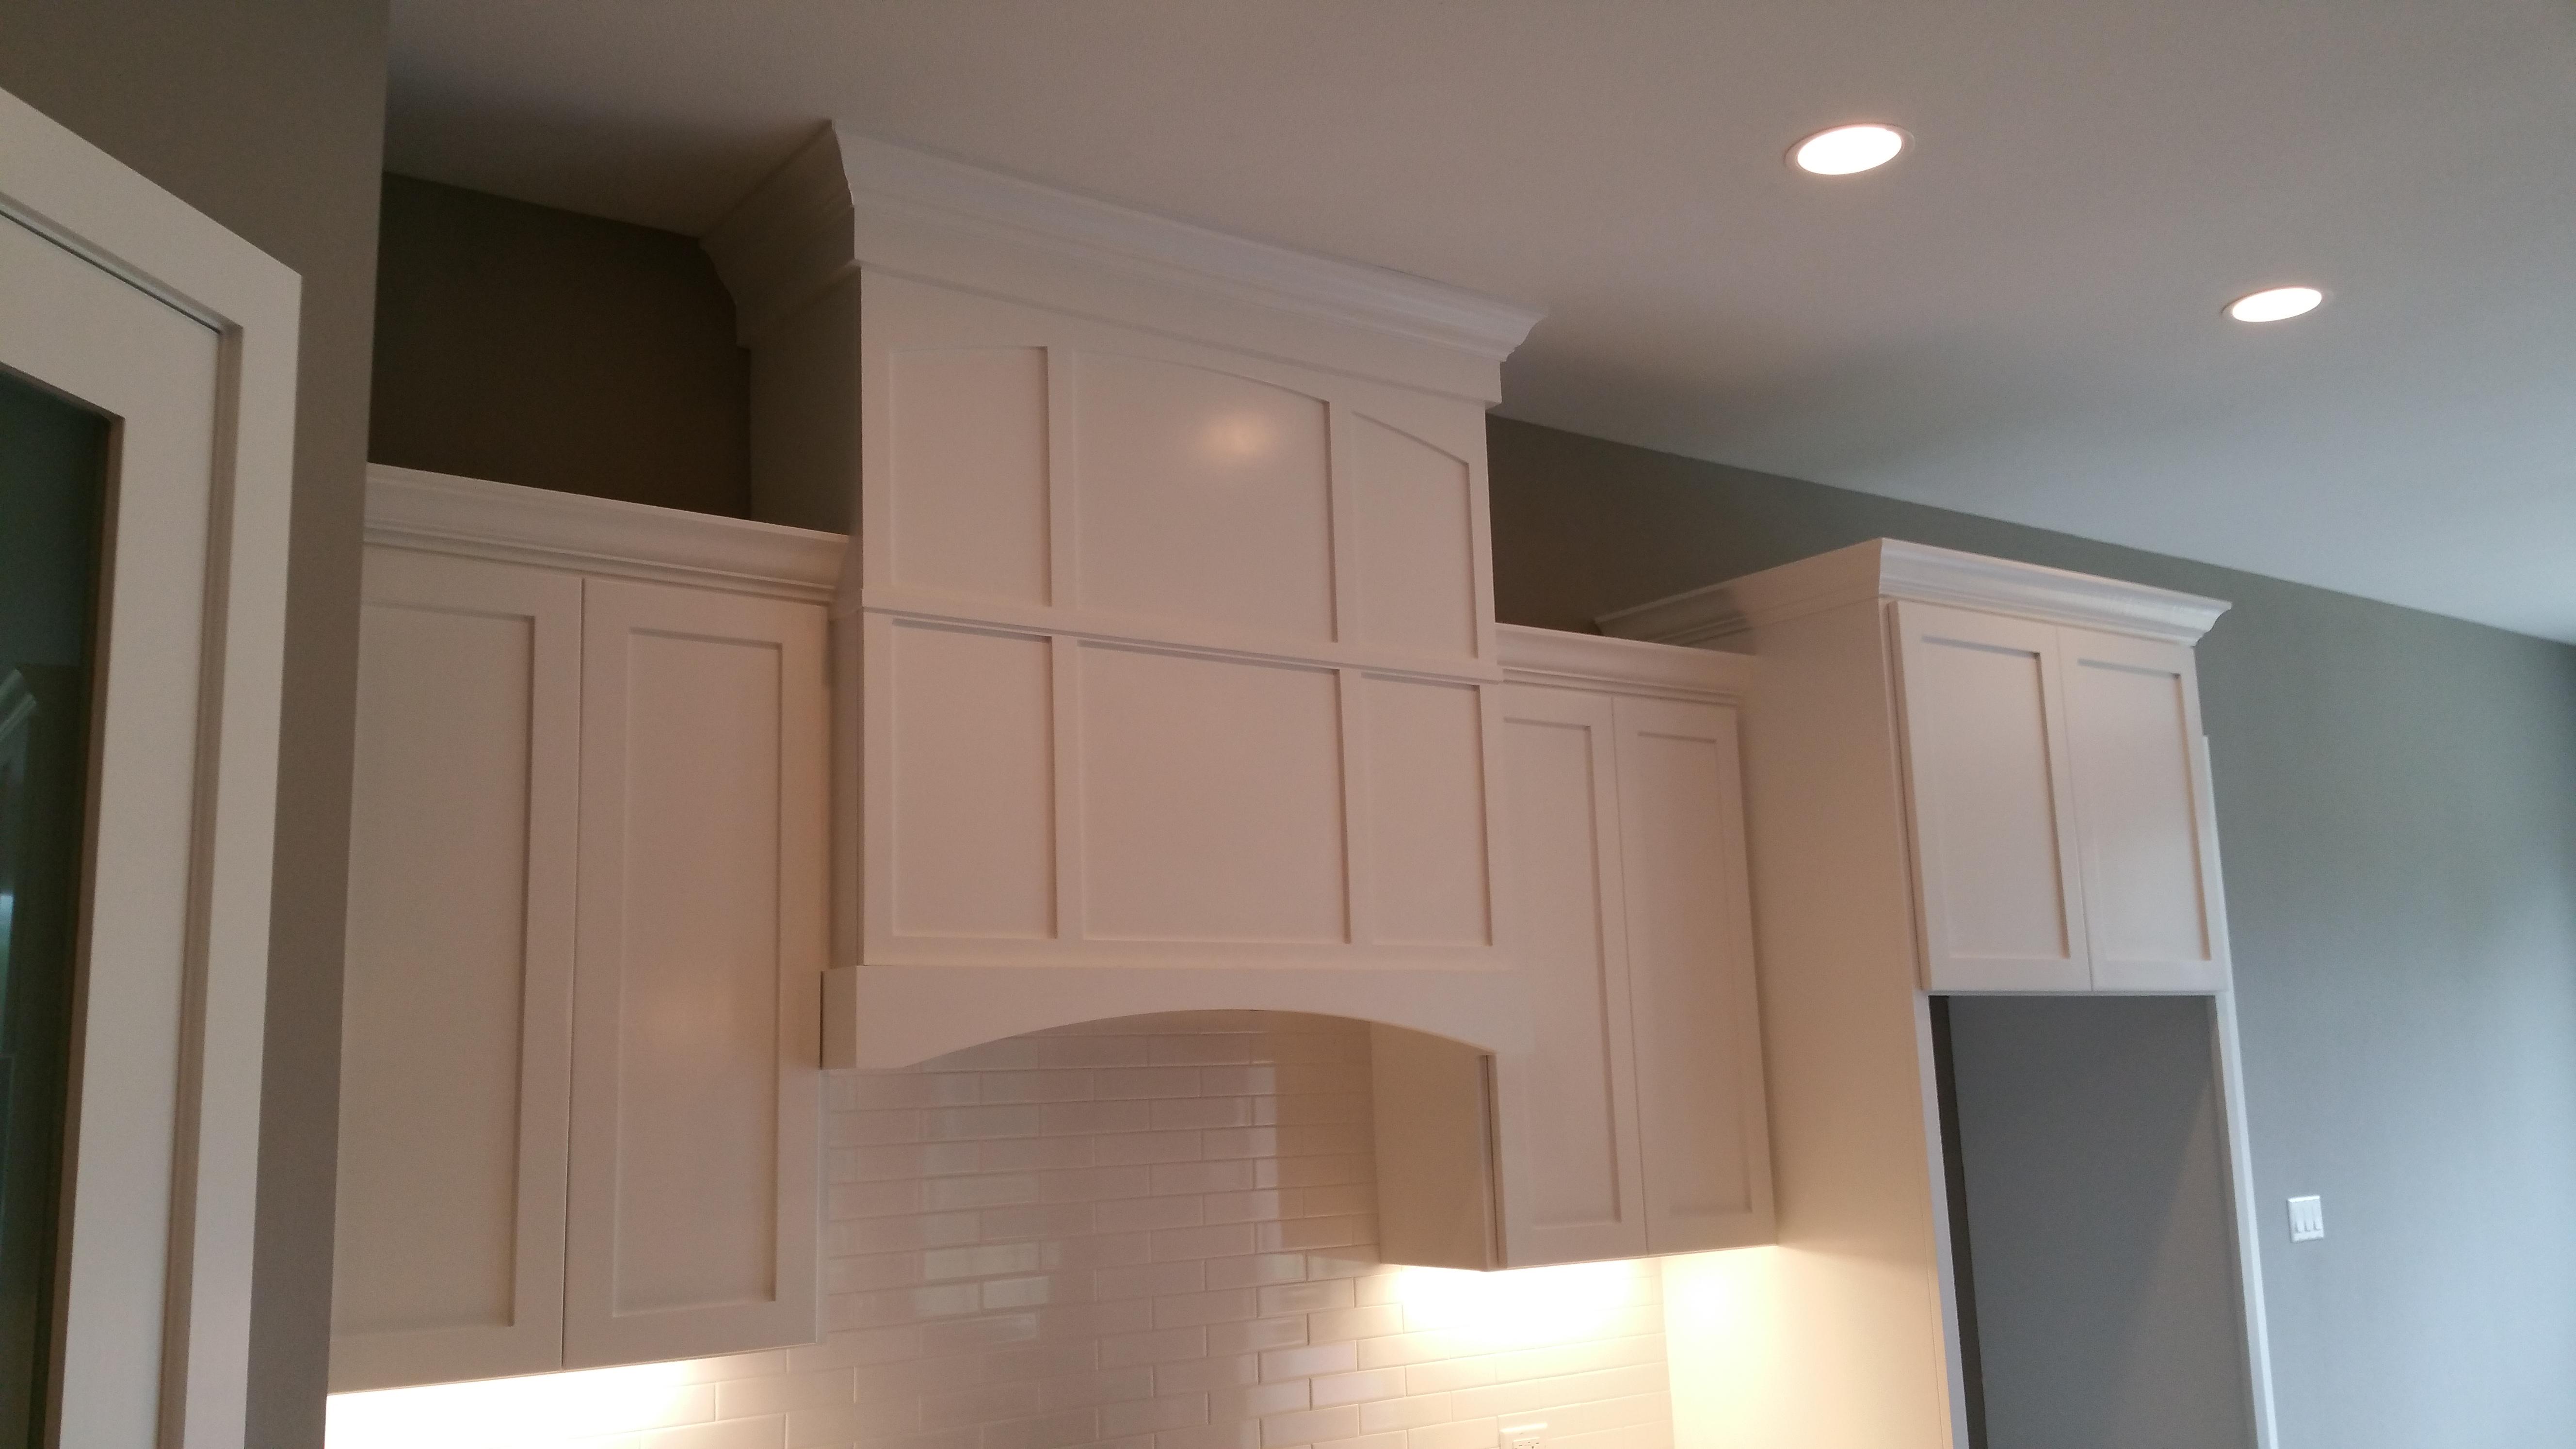 custom kitchen cabinet stove hood by jb murphy custom cabinet maker - Kitchen View Custom Cabinets